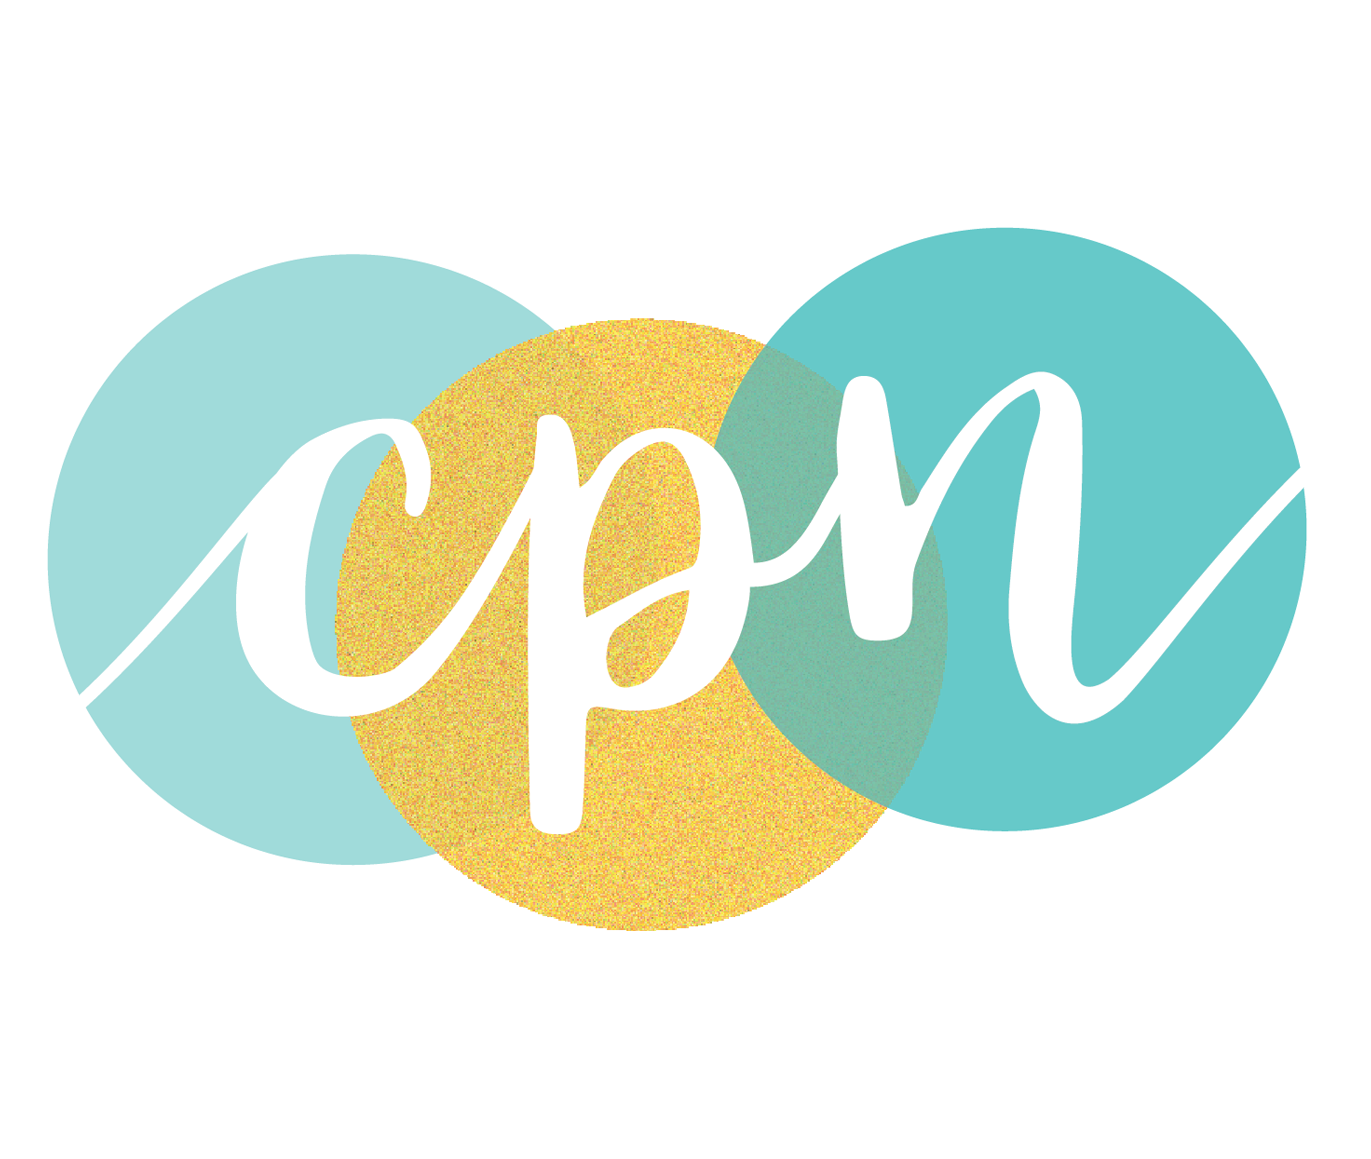 Primary Brandmark in Full Color on Transparent for Capitol Park Nannies, Sacramento-based Nanny Agency